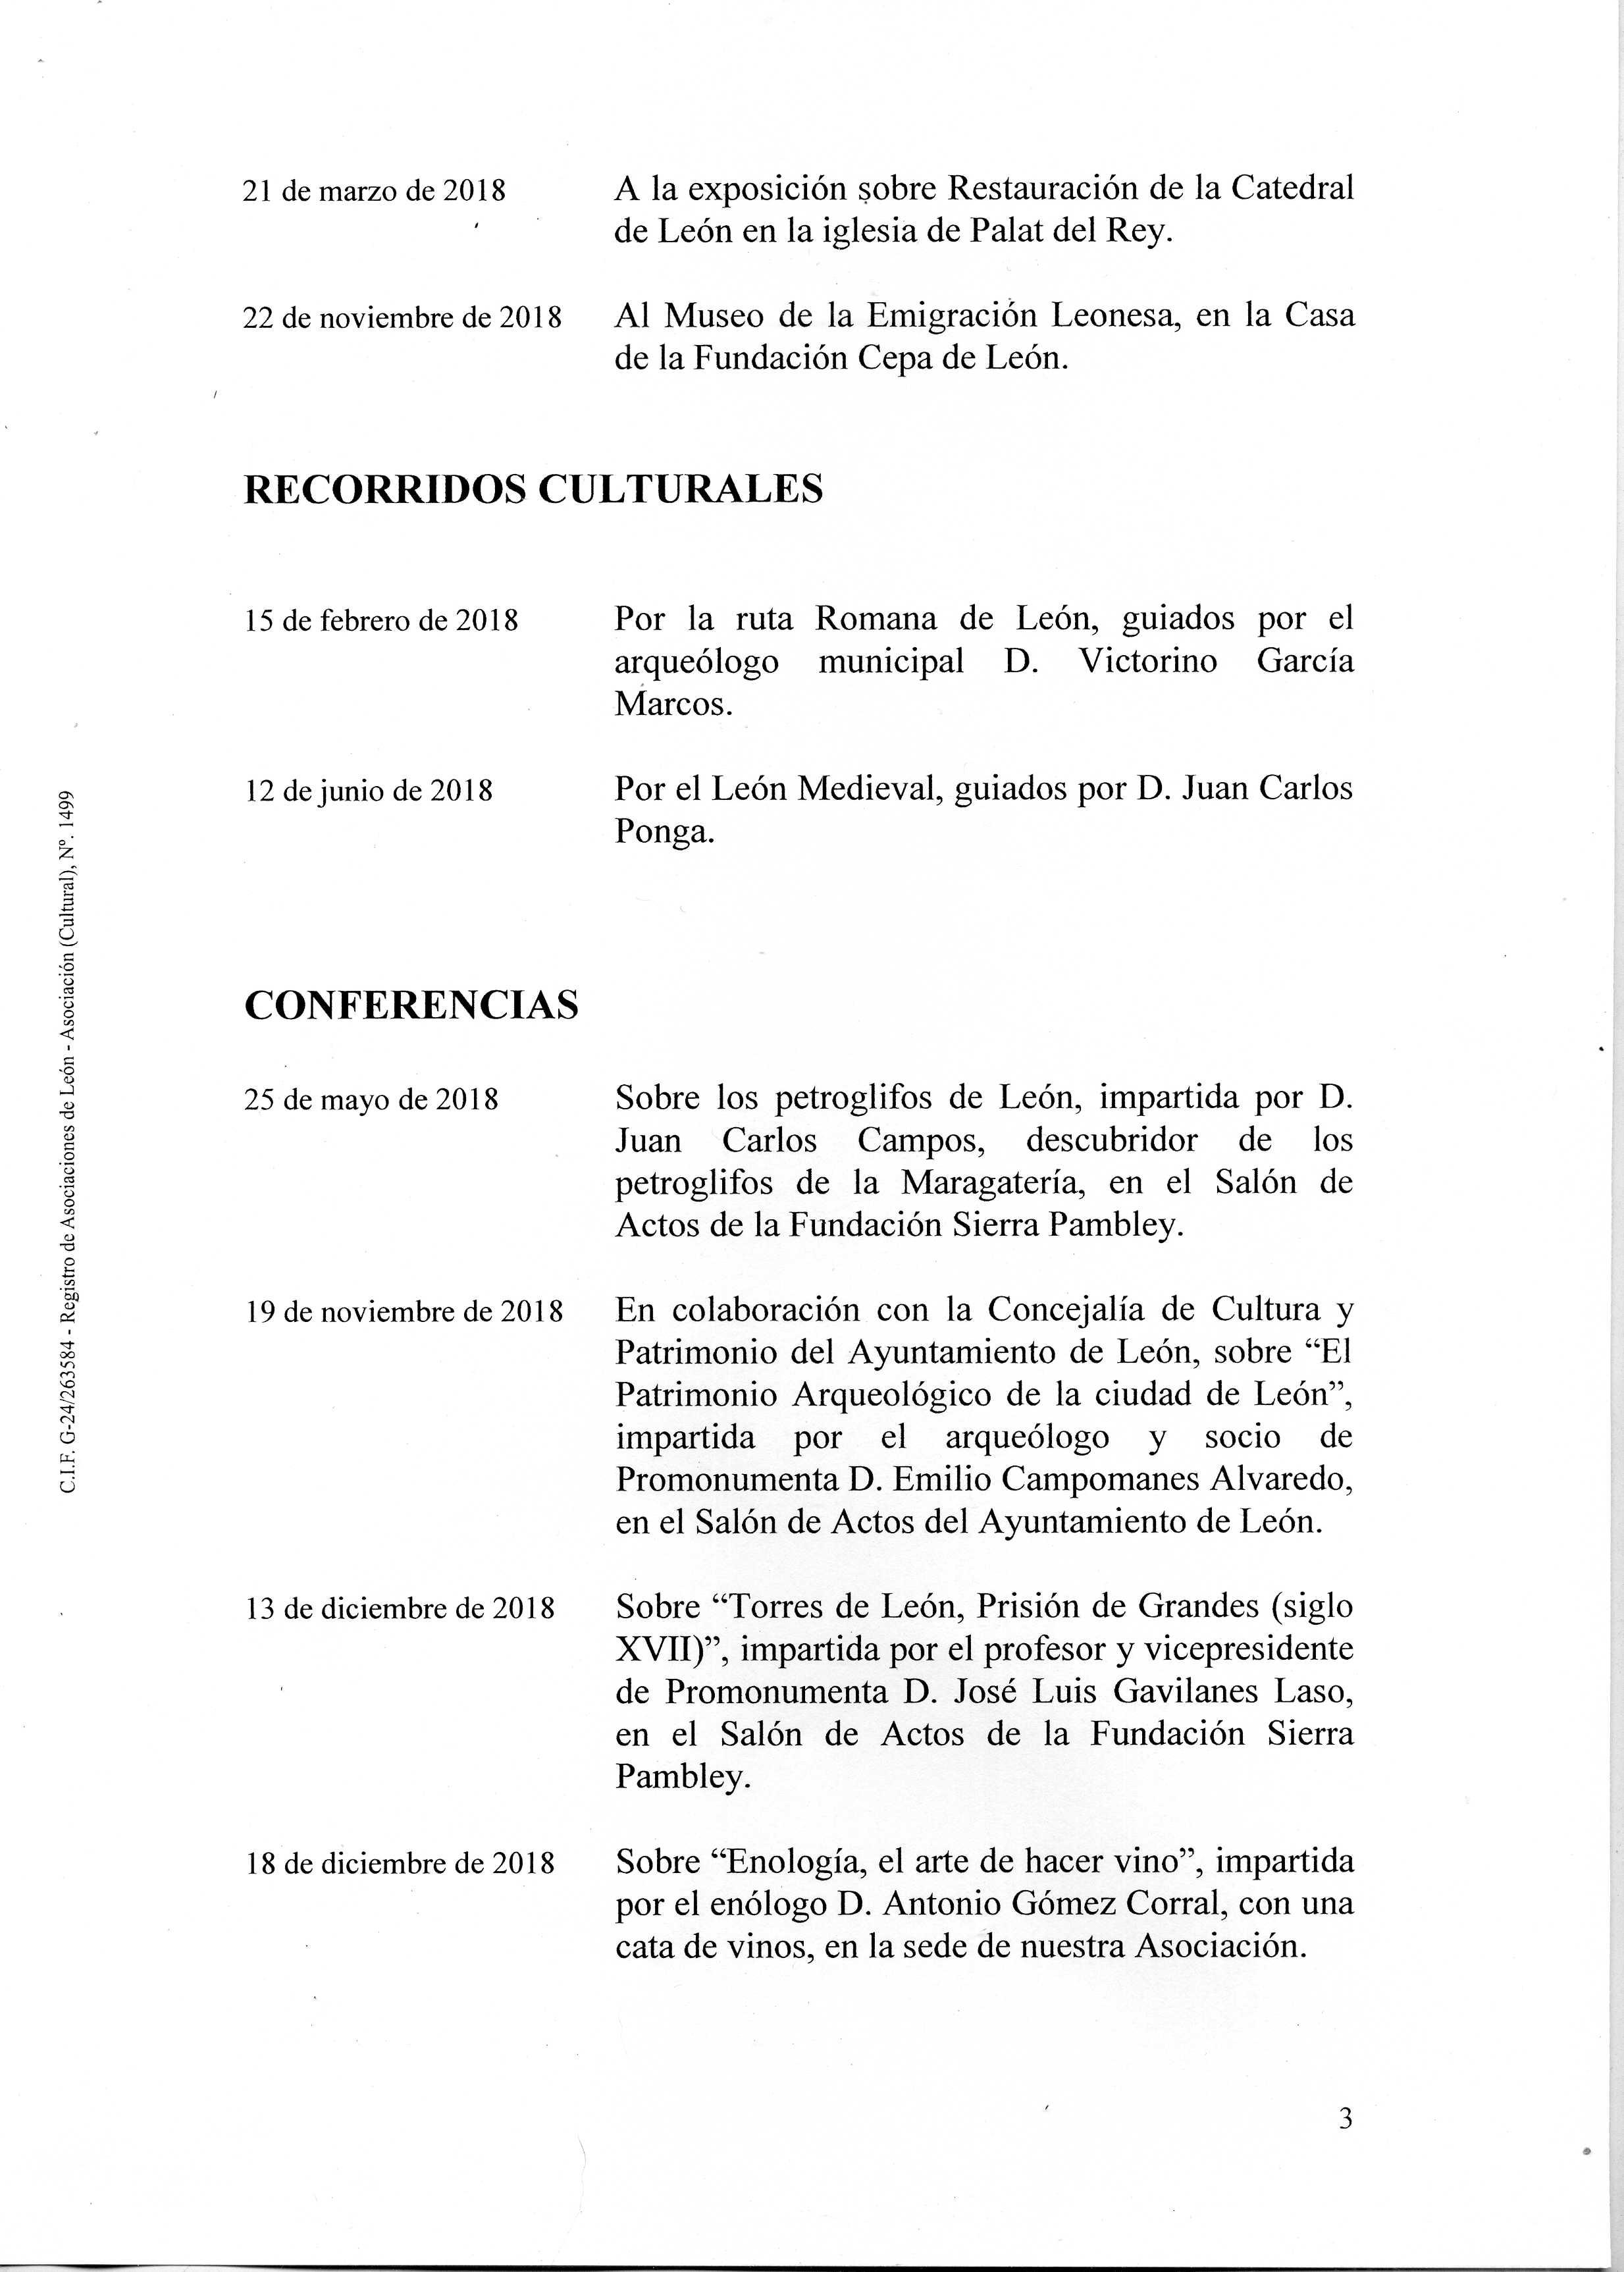 PROMONUMENTA ACTIVIDADES 2018003